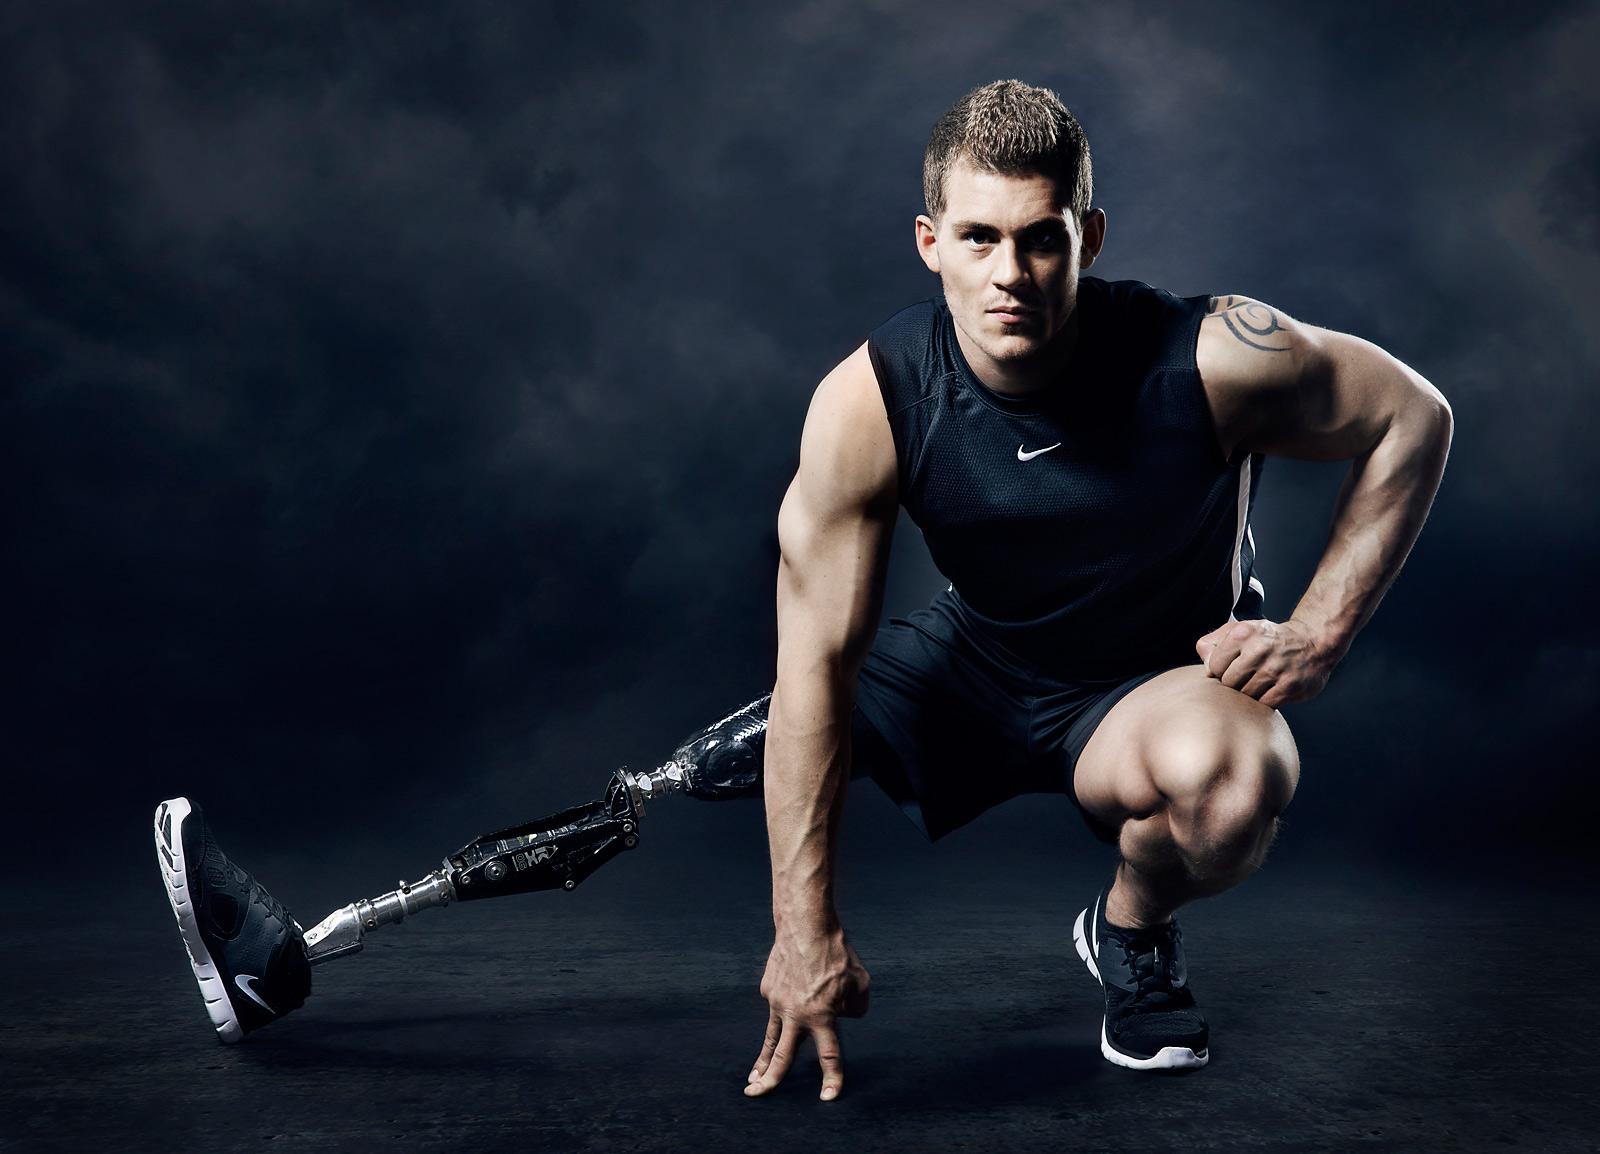 Disabled male model Jack eyers